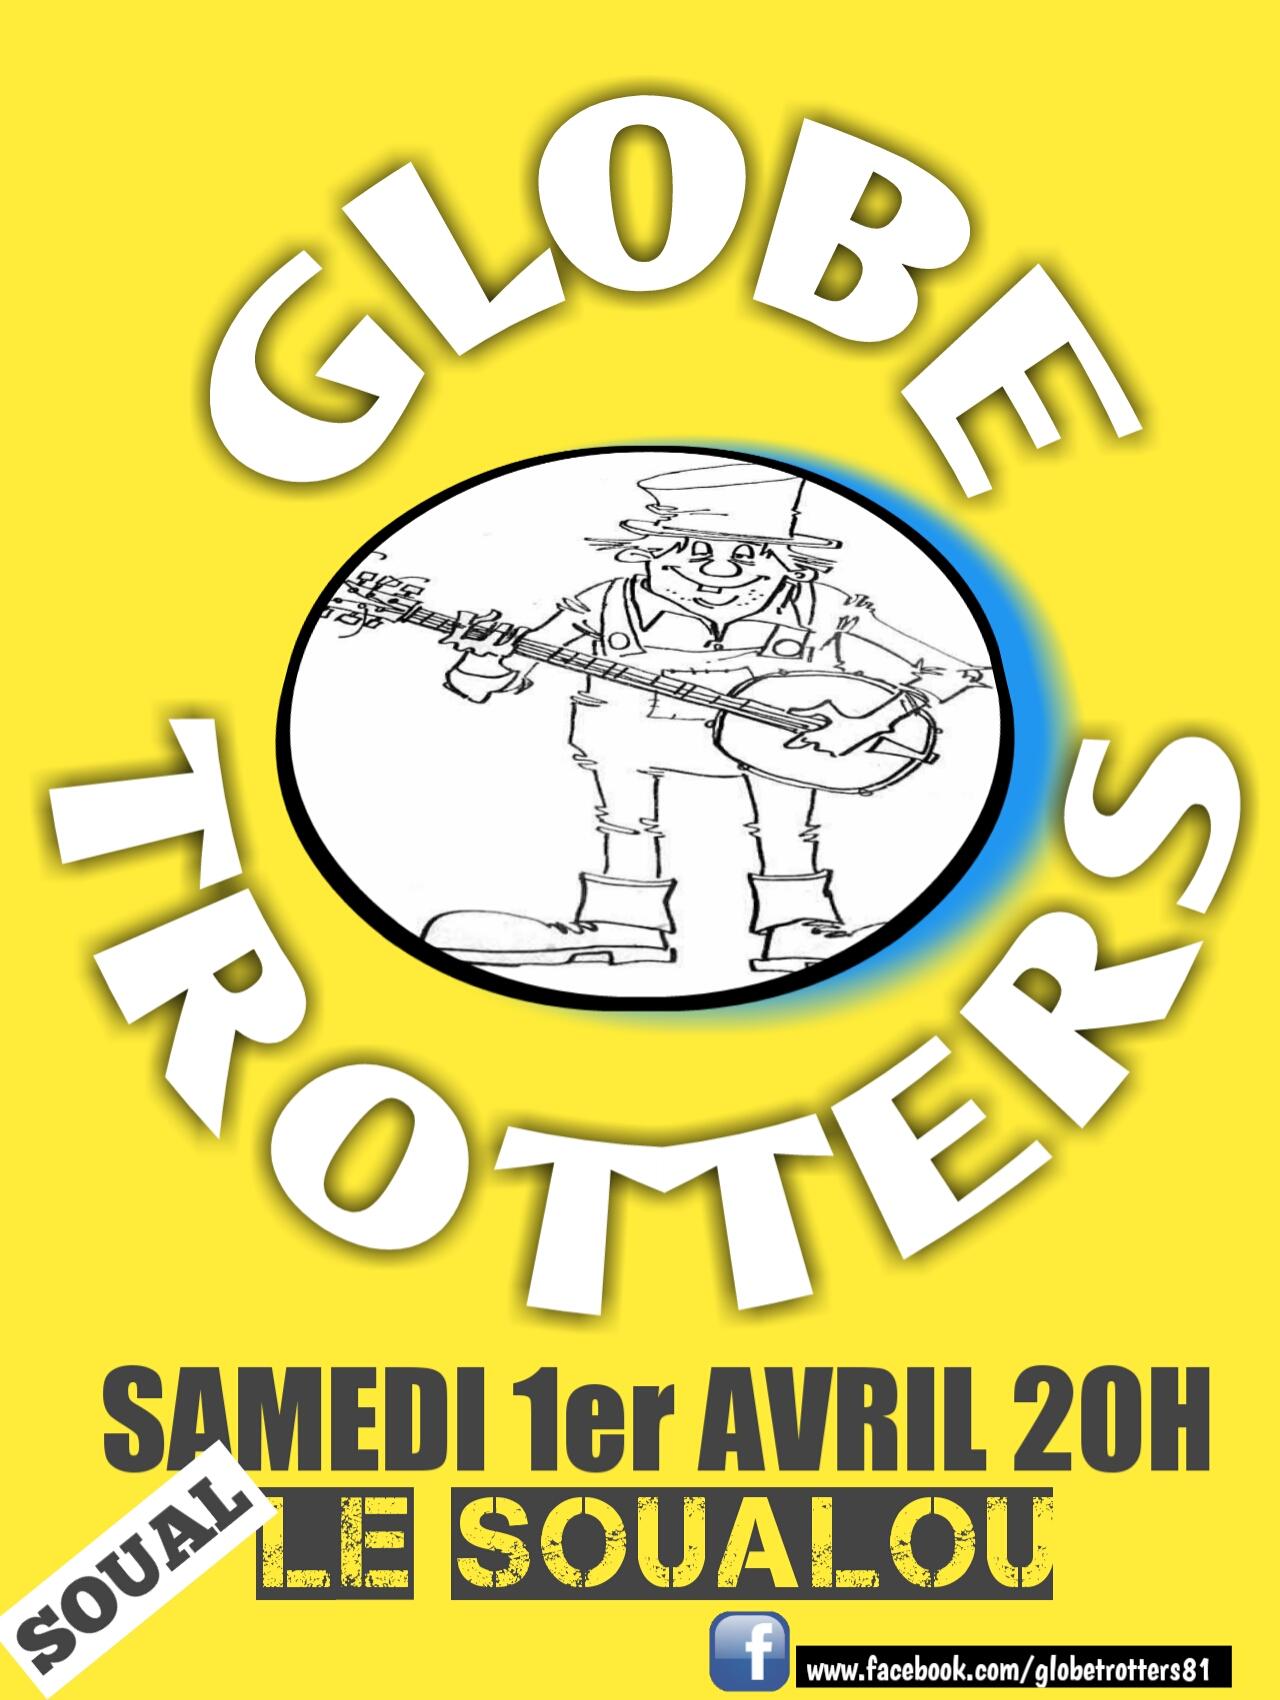 Les Globe Trotters